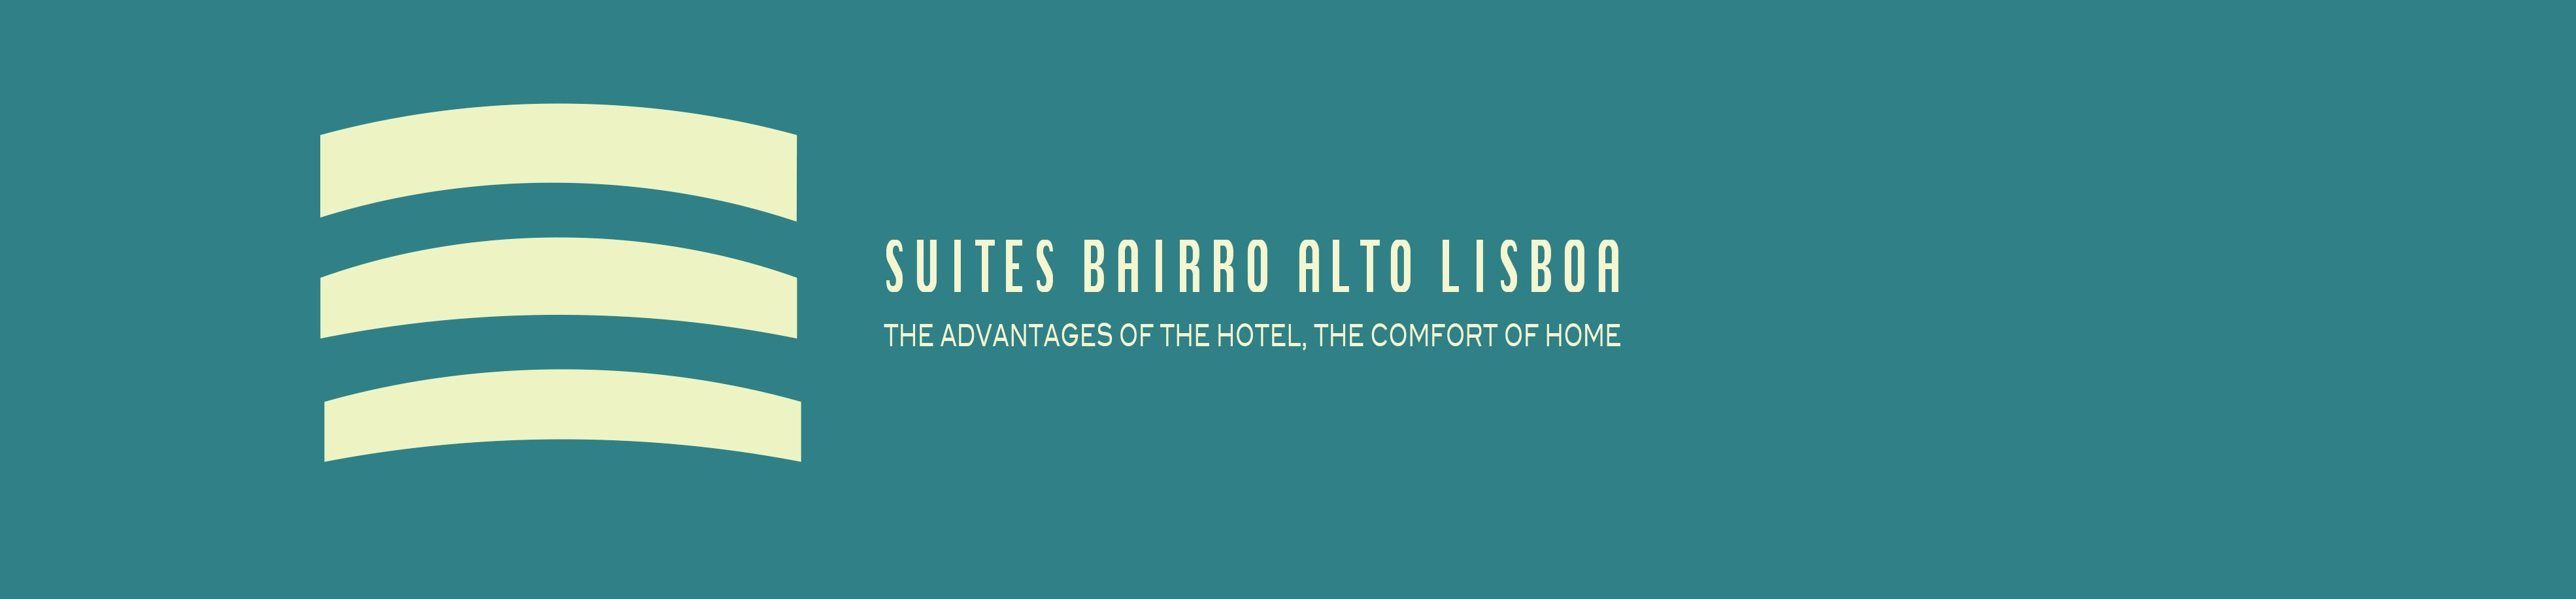 SUITES BAIRRO ALTO LISBOA